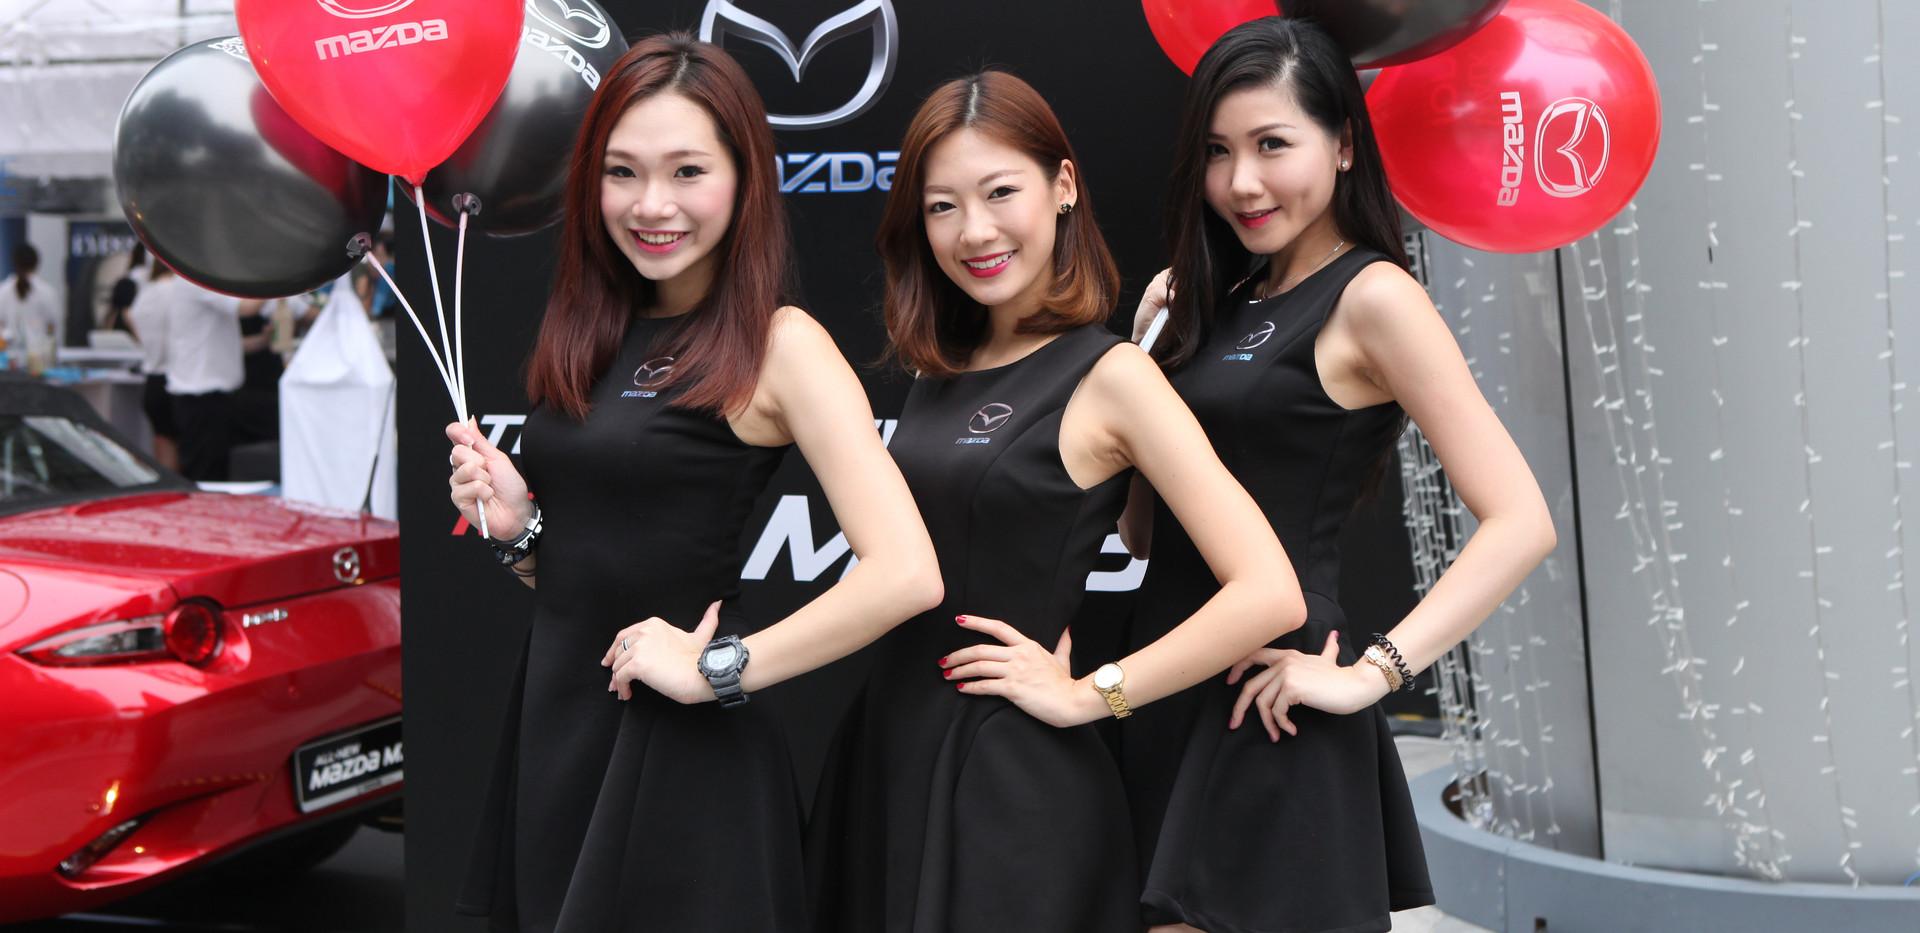 Mazda Her World Event